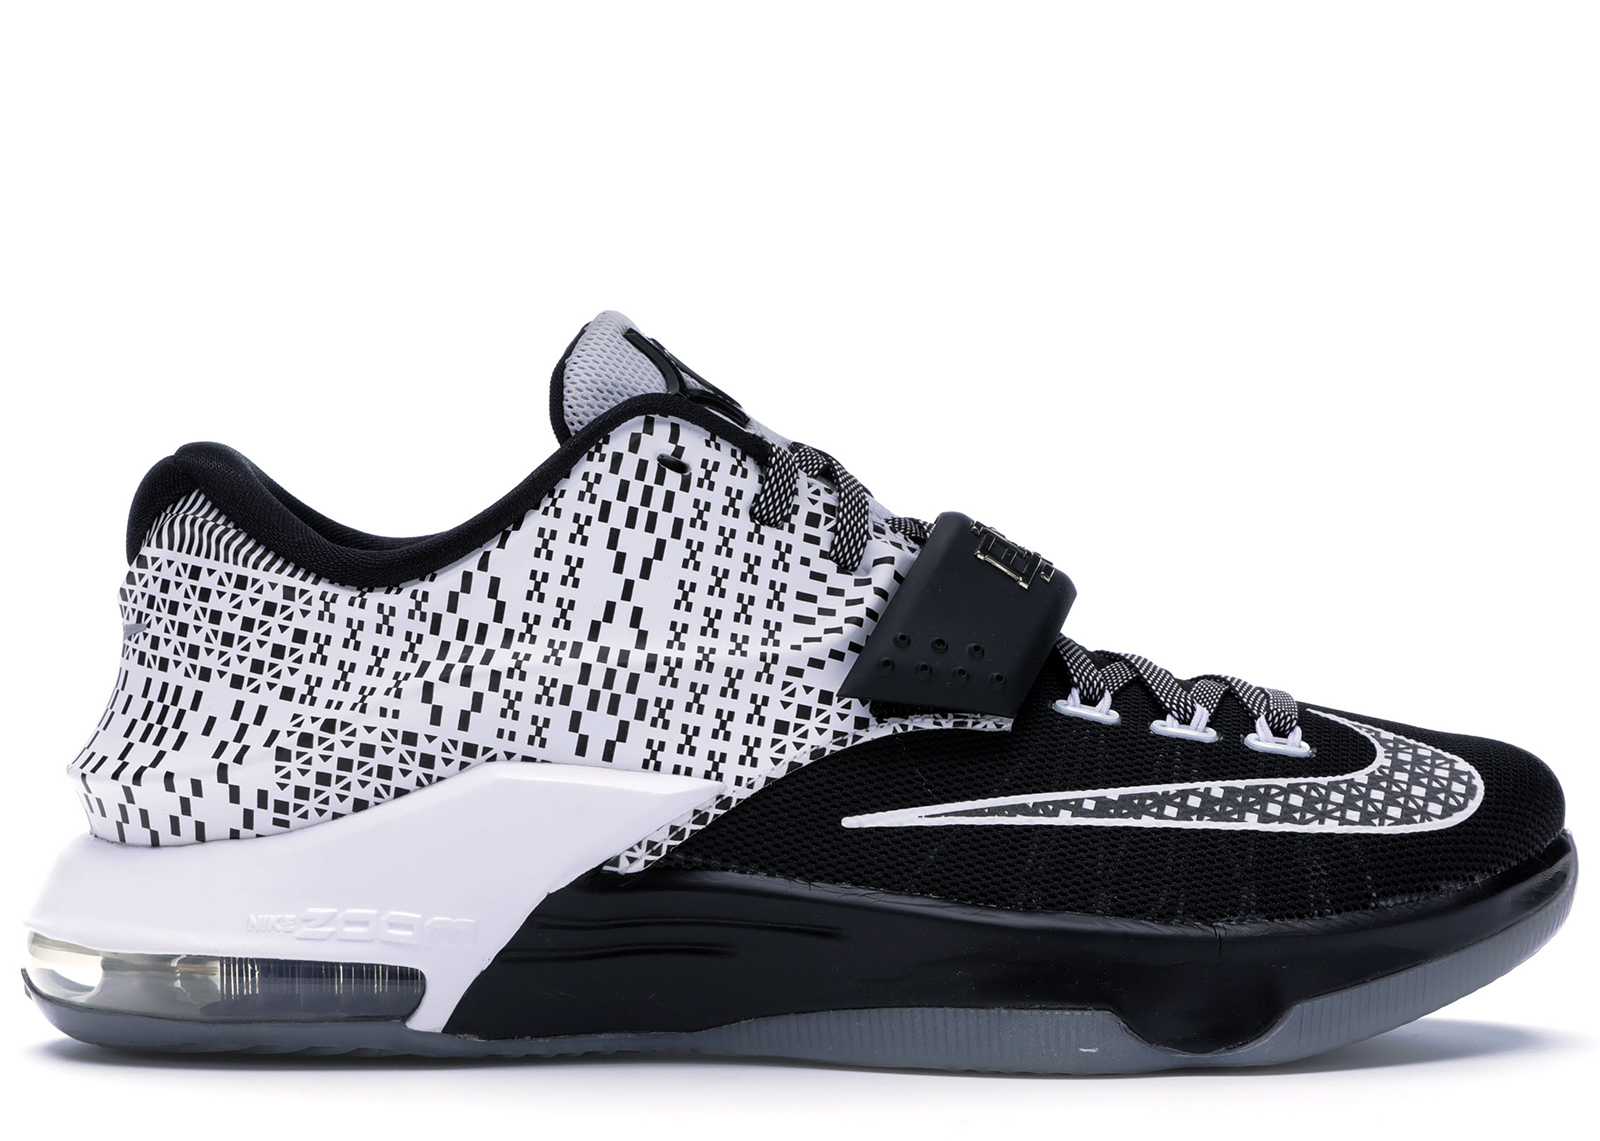 Nike KD 7 BHM 2015 - 718817-010